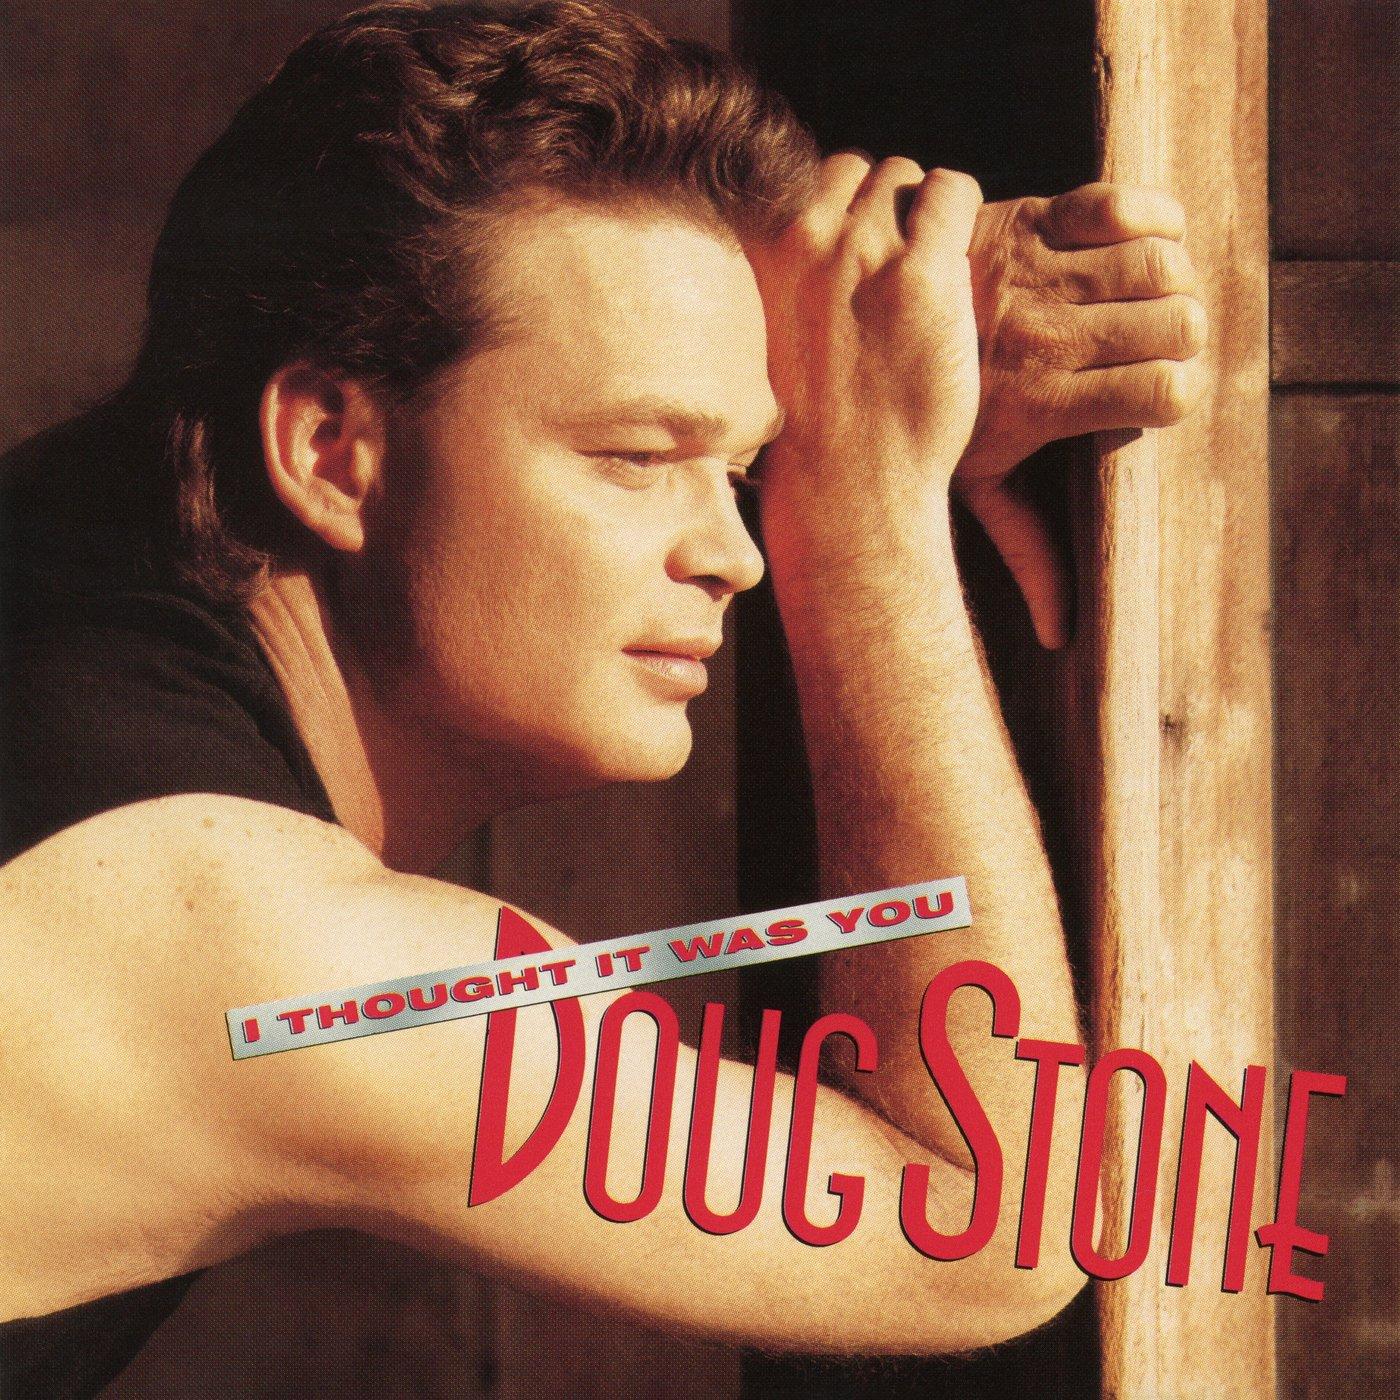 Doug Stone-I Thought It Was You-CD-FLAC-1991-FLACME